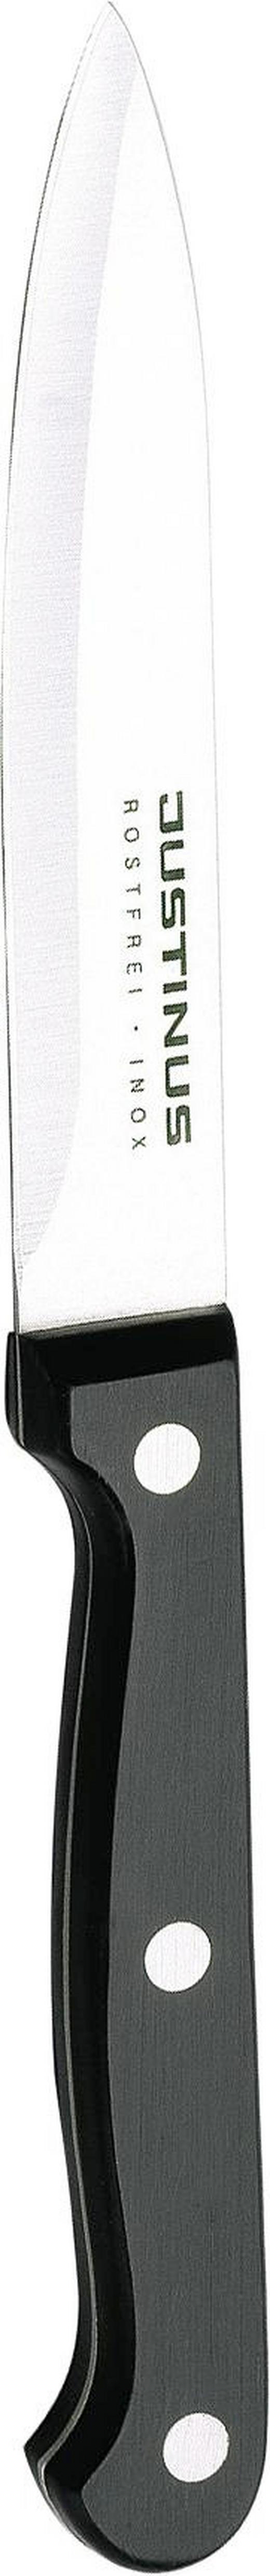 ALLZWECKMESSER   19,5 cm - Basics, Kunststoff/Metall (19,5cm) - JUSTINUS